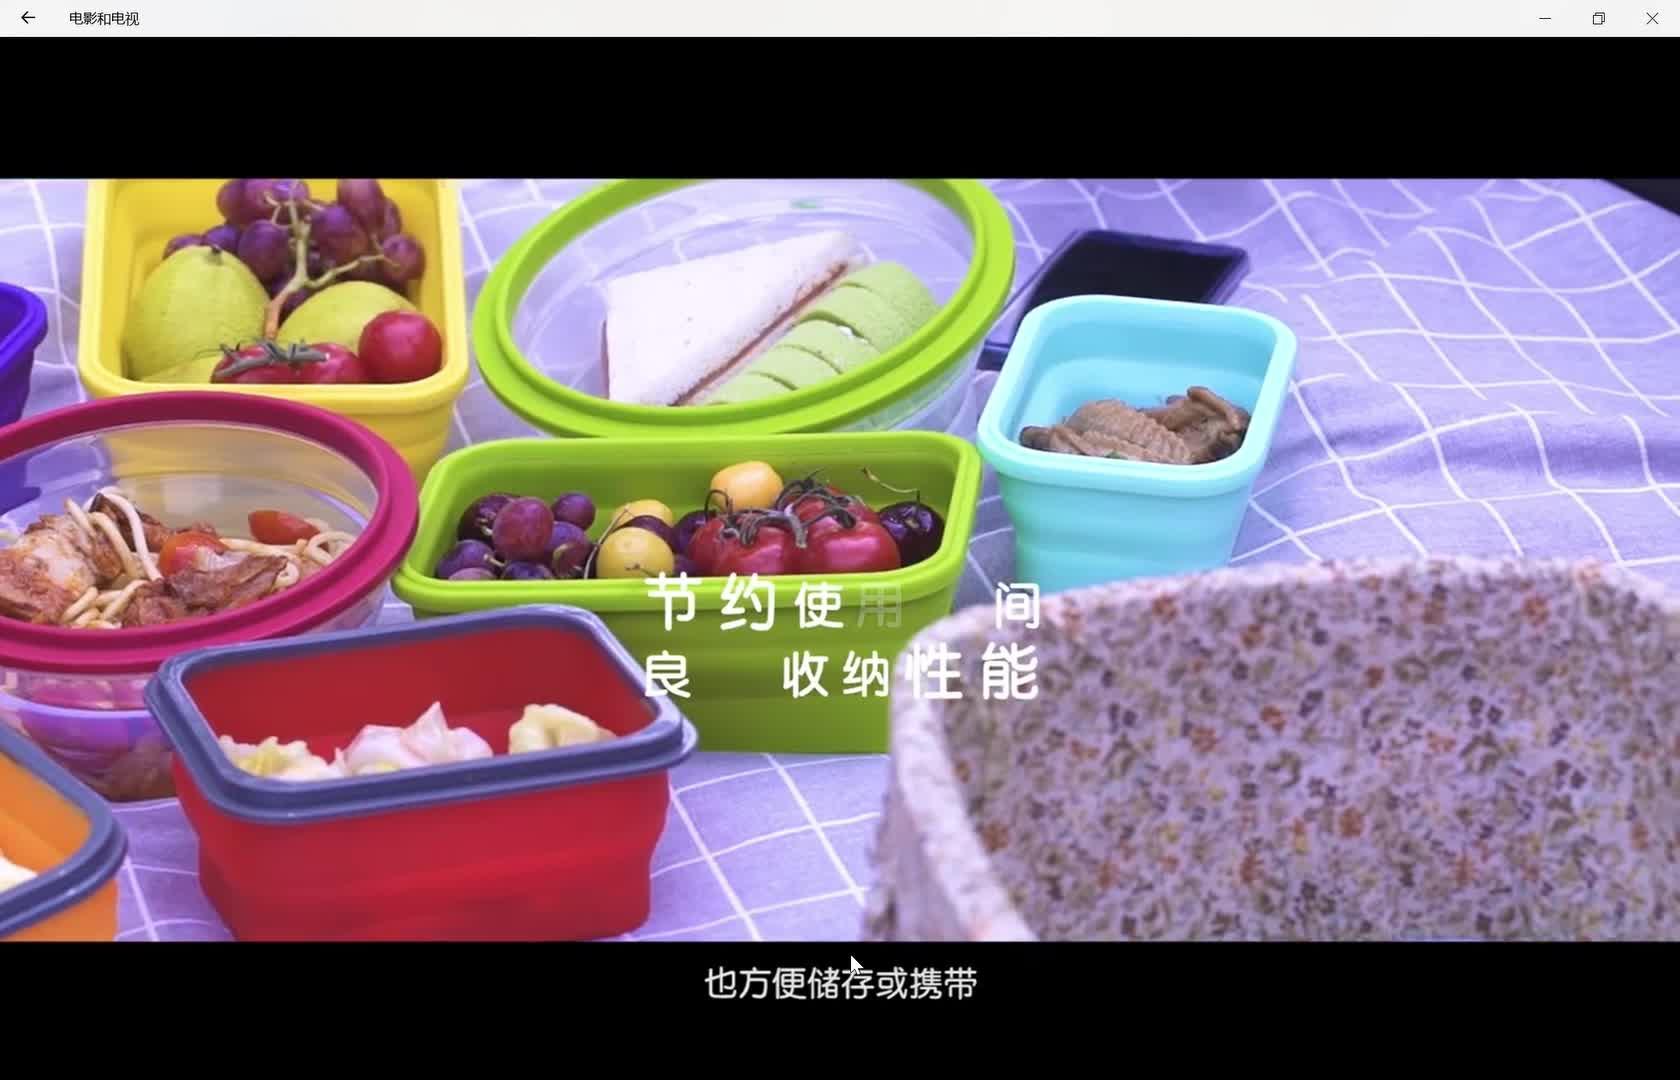 BPA ฟรีน่ารัก Eco Custom ช่องฉนวน Tiffin เด็กโรงเรียน Bento ซิลิโคนอาหารชุดกล่องอาหารกลางวันสำหรับเด็ก